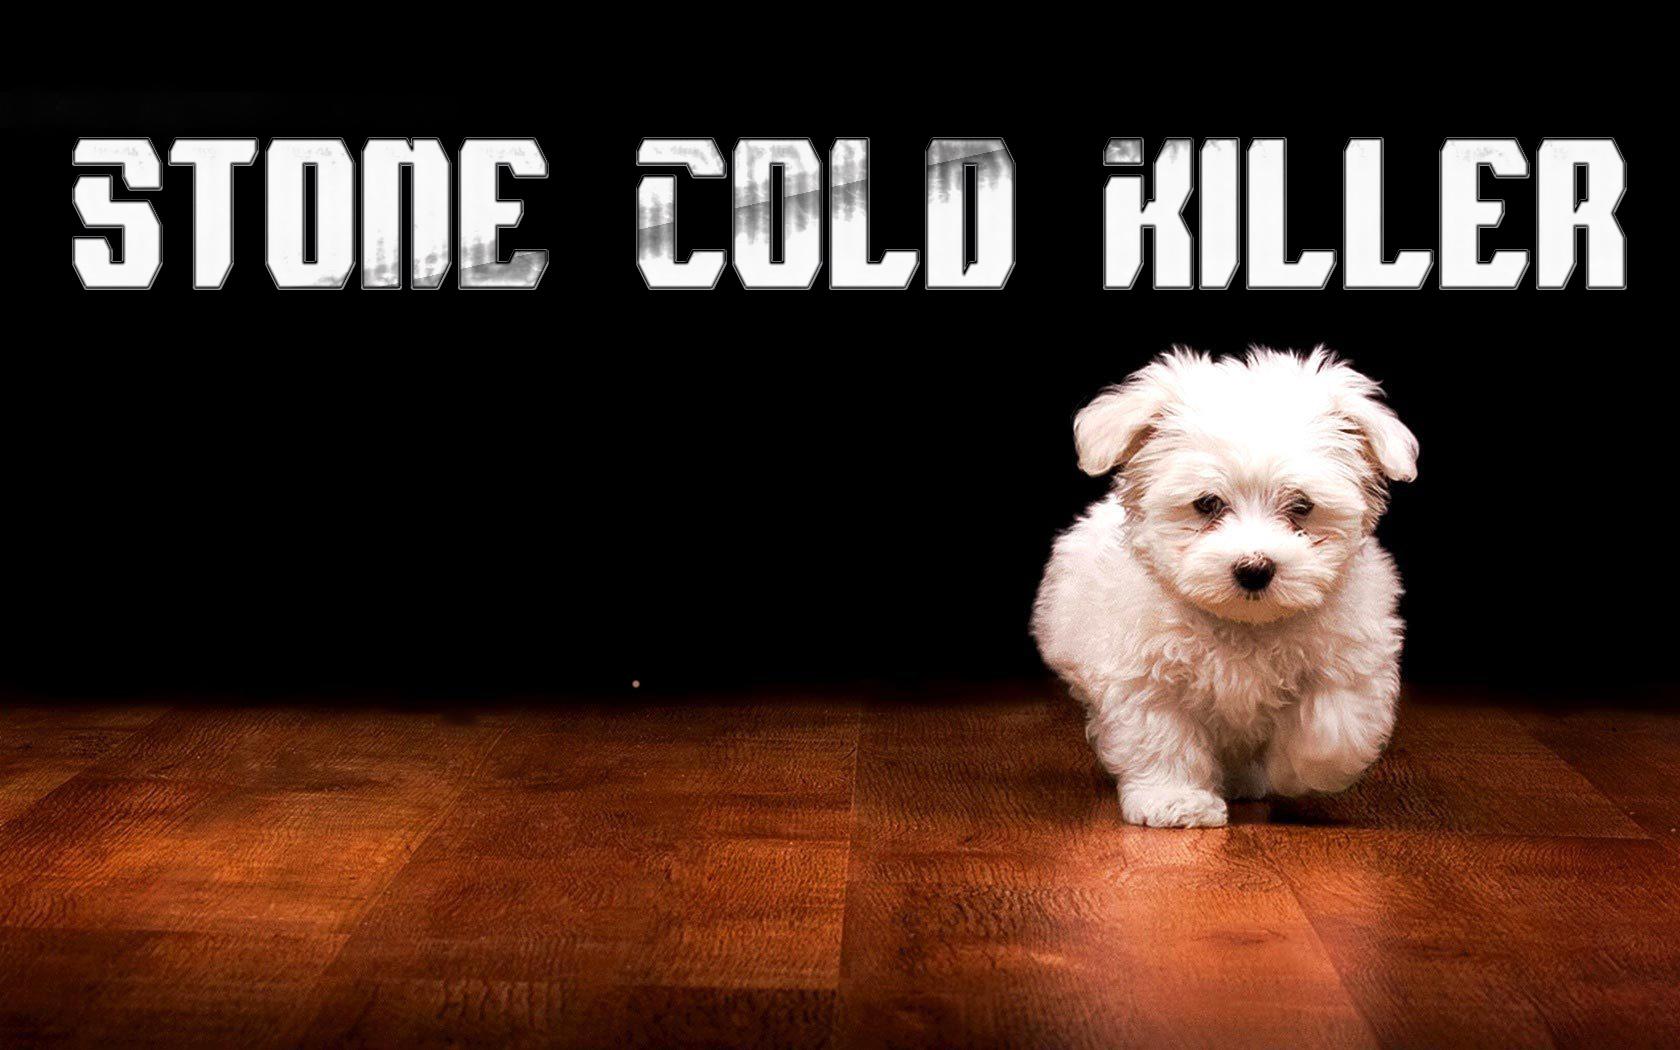 Funny Dog Meme Backgrounds : Cute puppy wallpaper funny wallpapersafari